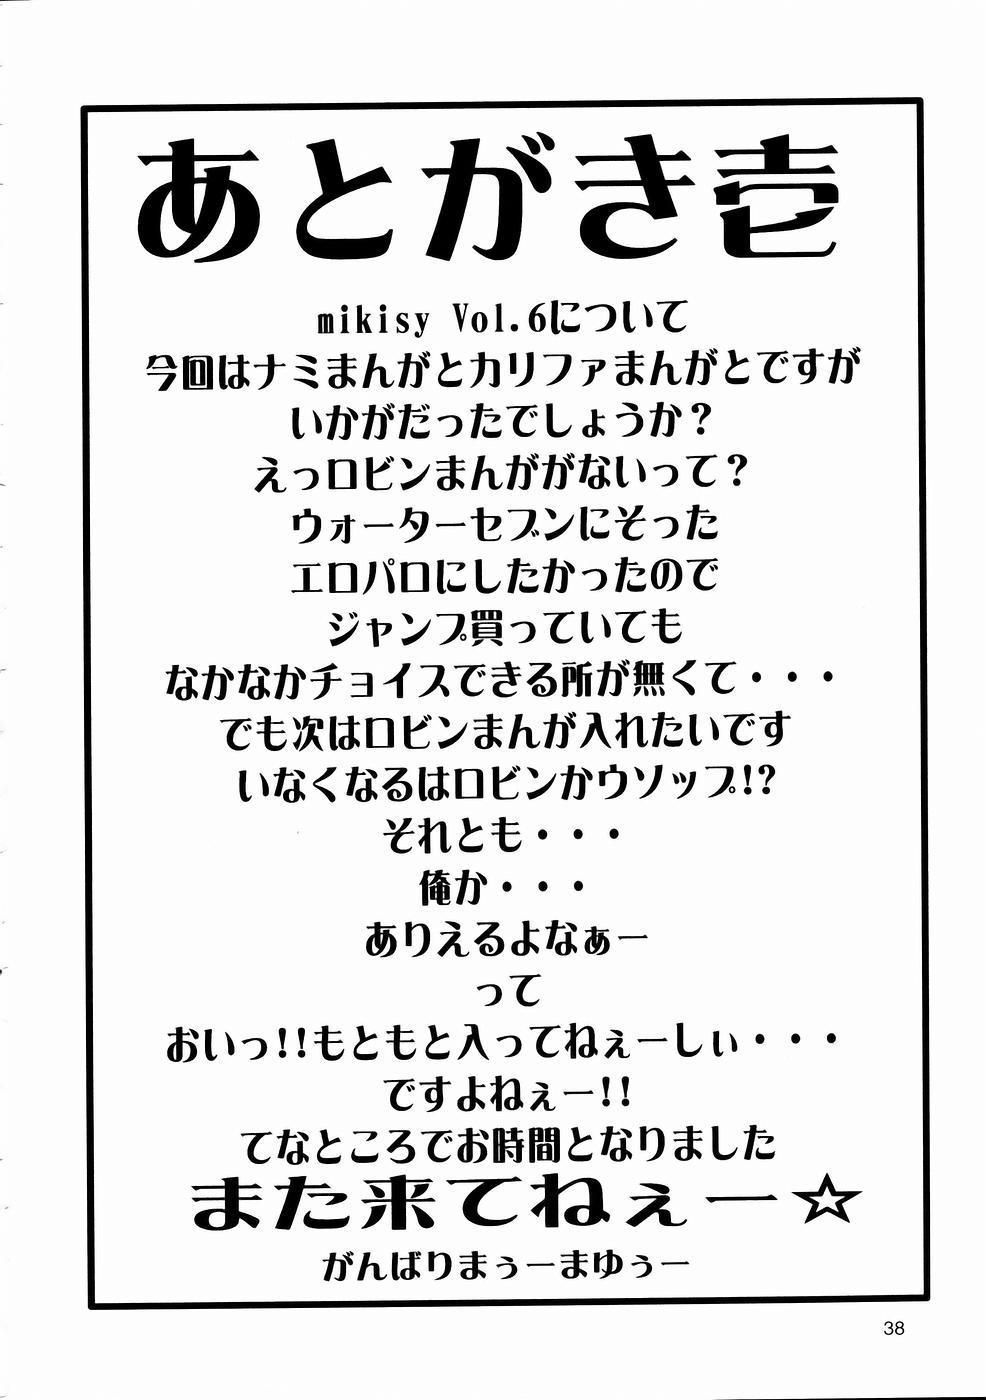 Mikisy Vol. 6 38